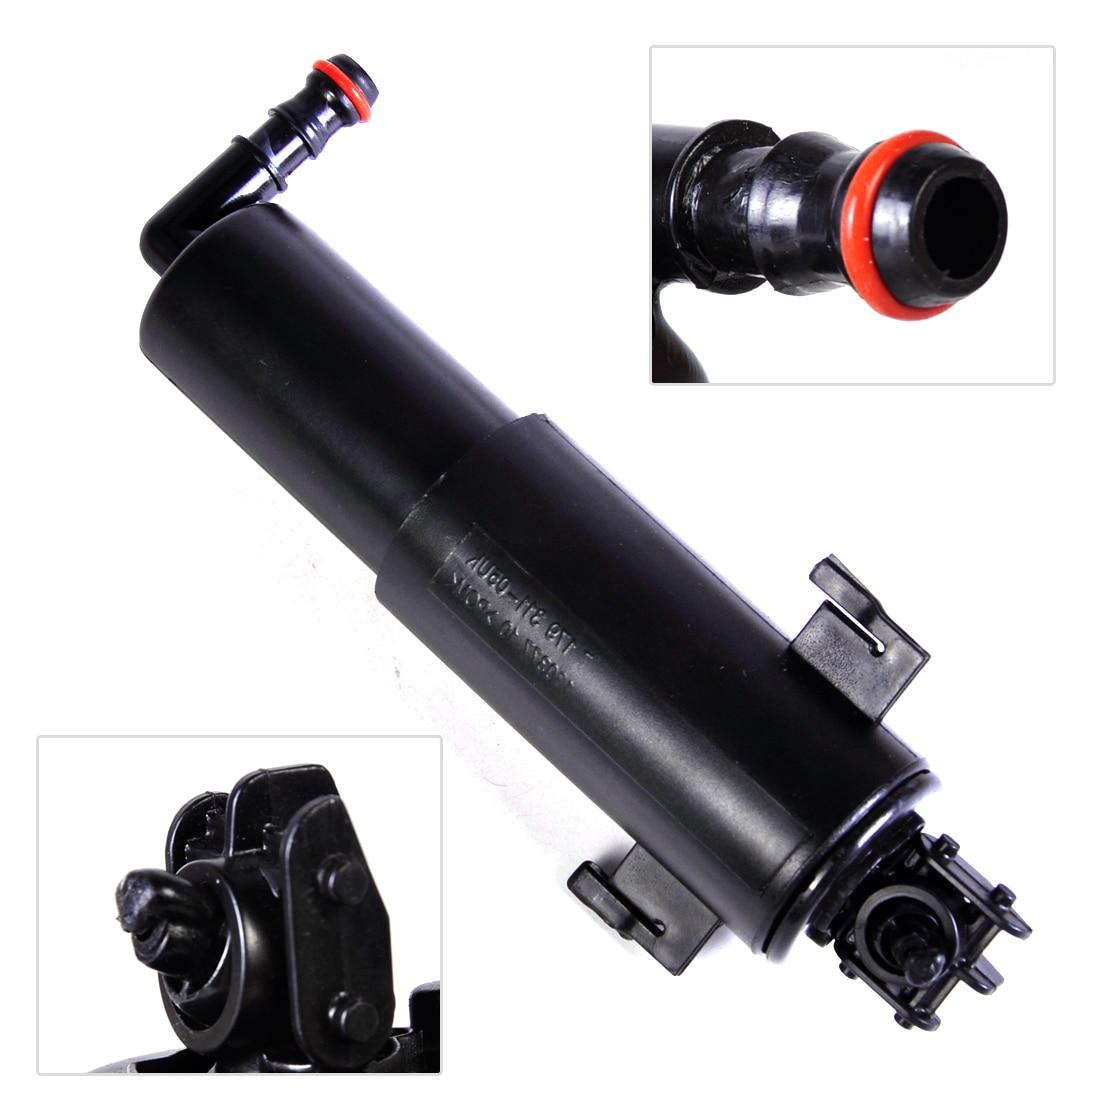 DWCX OEM 61677179311 Headlight Headlamp Washer Nozzle Pump Cylinder for font b BMW b font E90